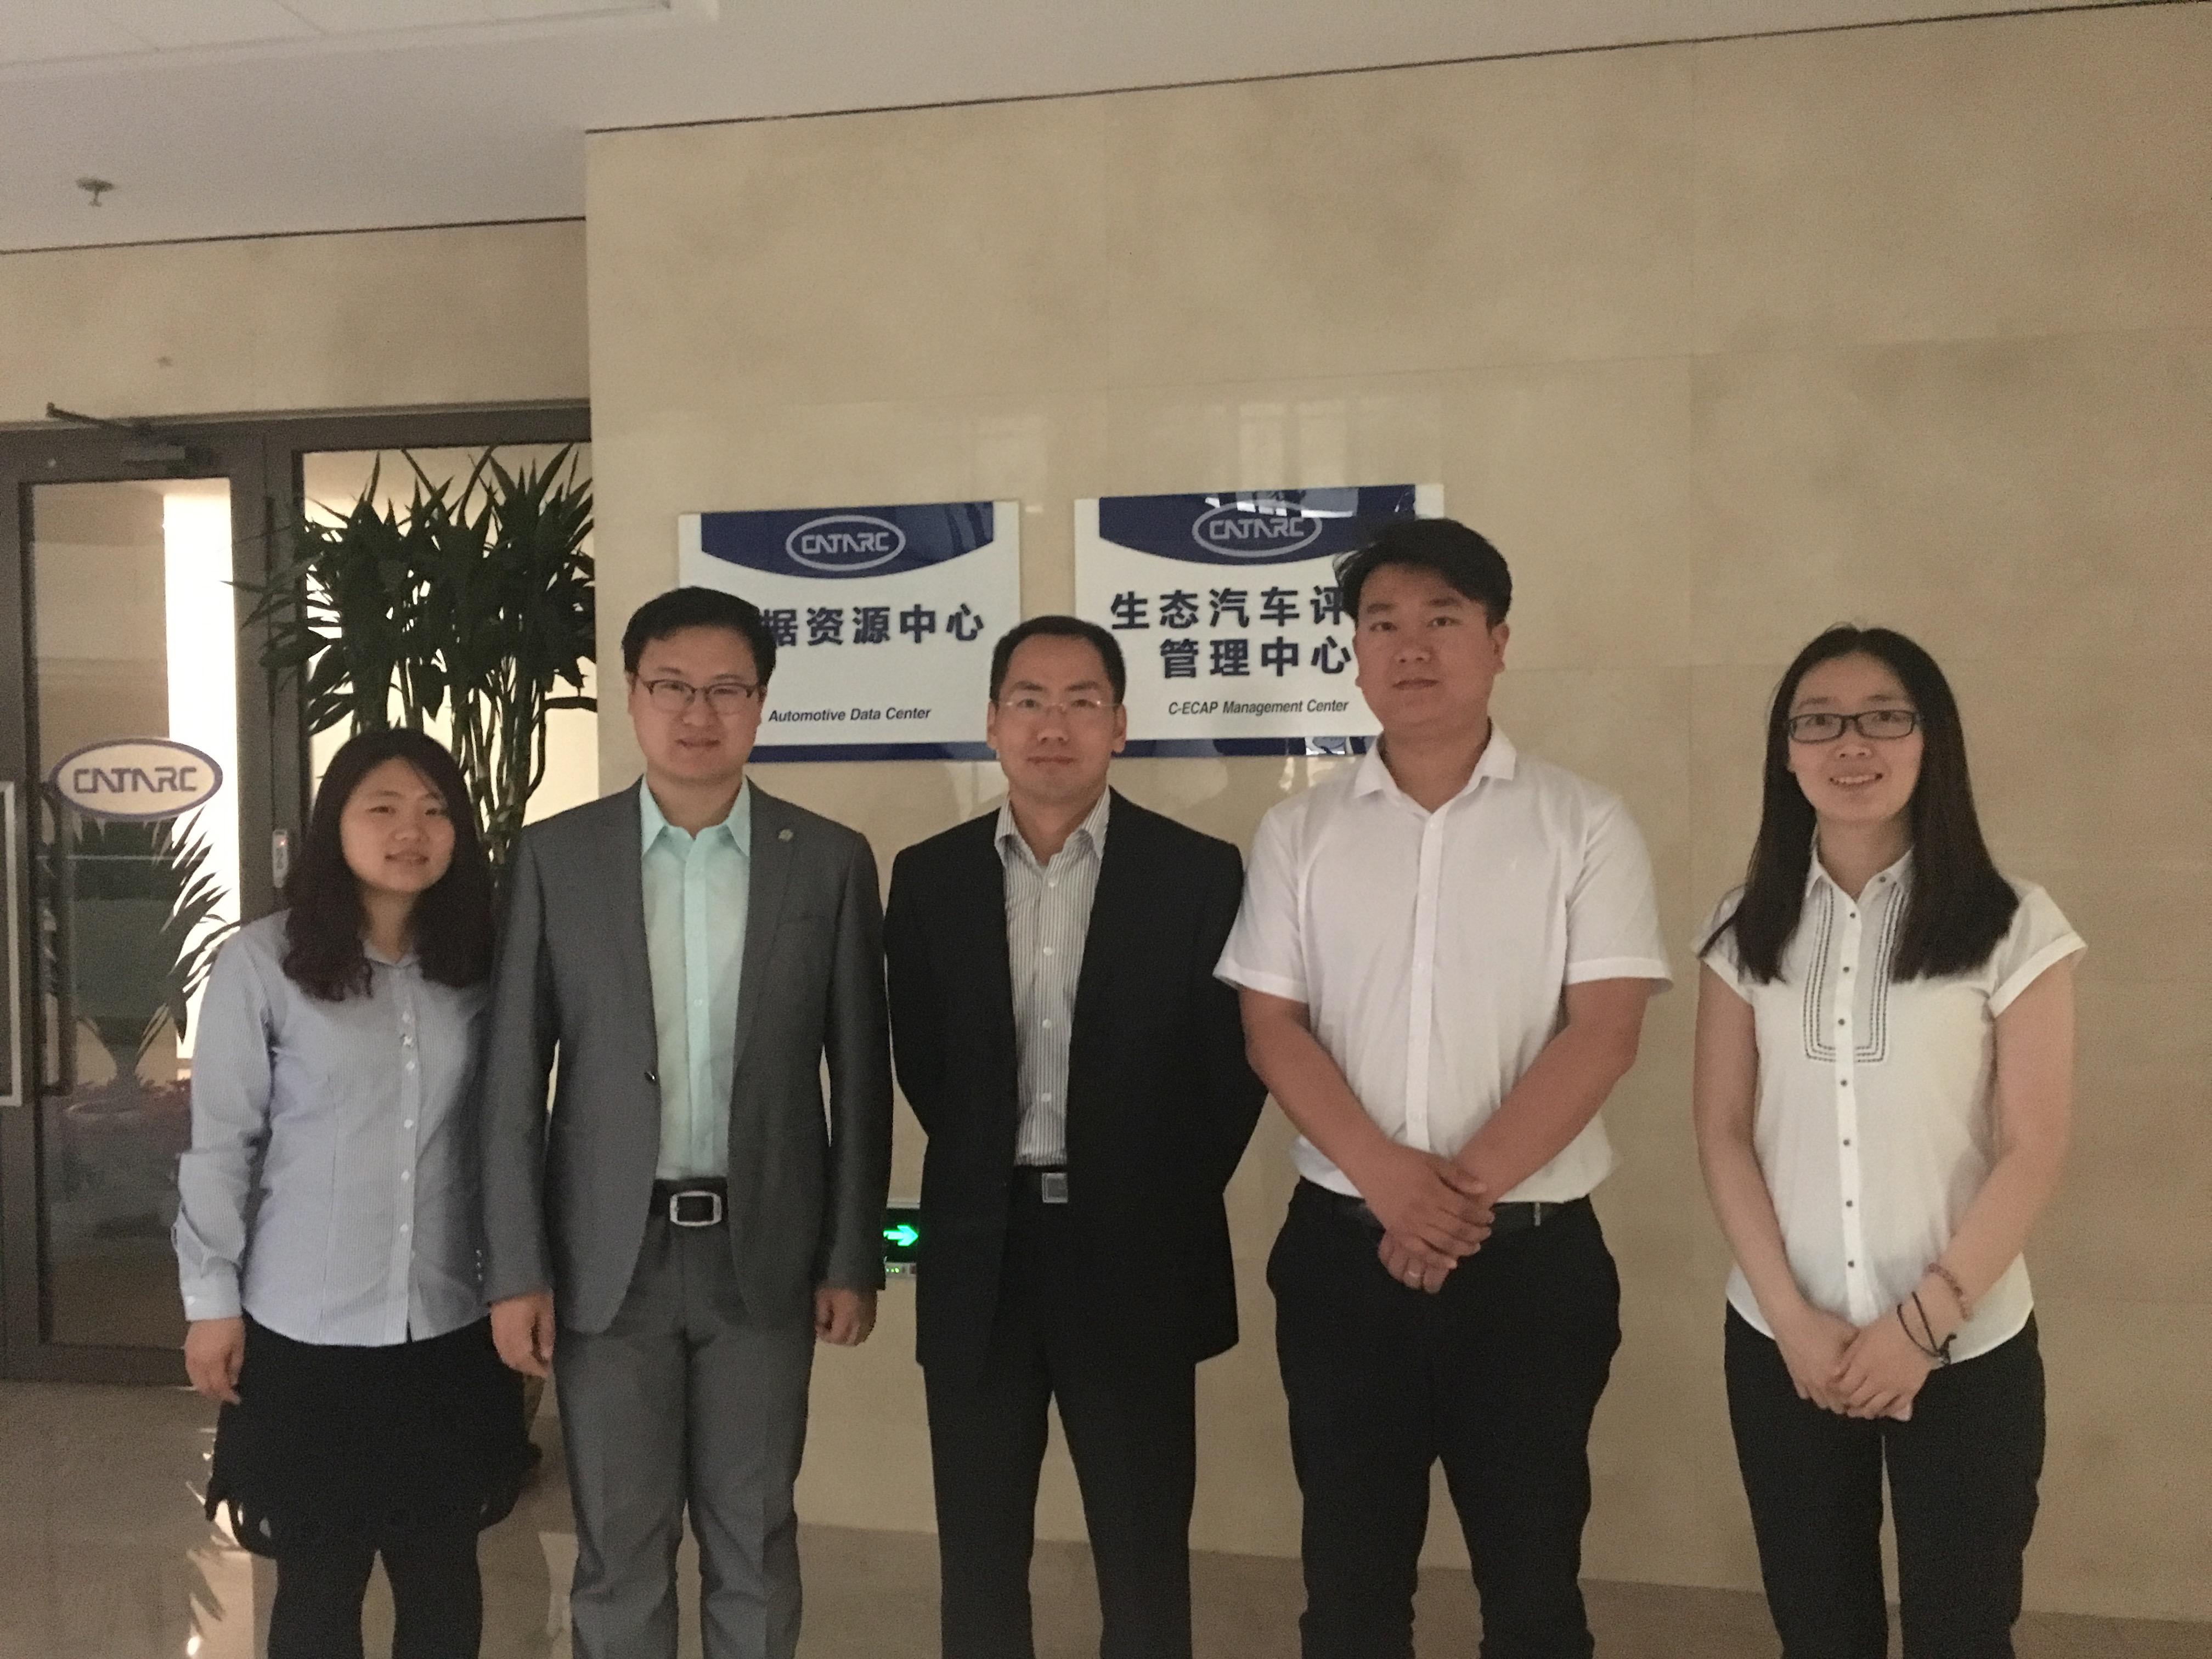 AICM拜访中国汽车技术研究中心天津总部